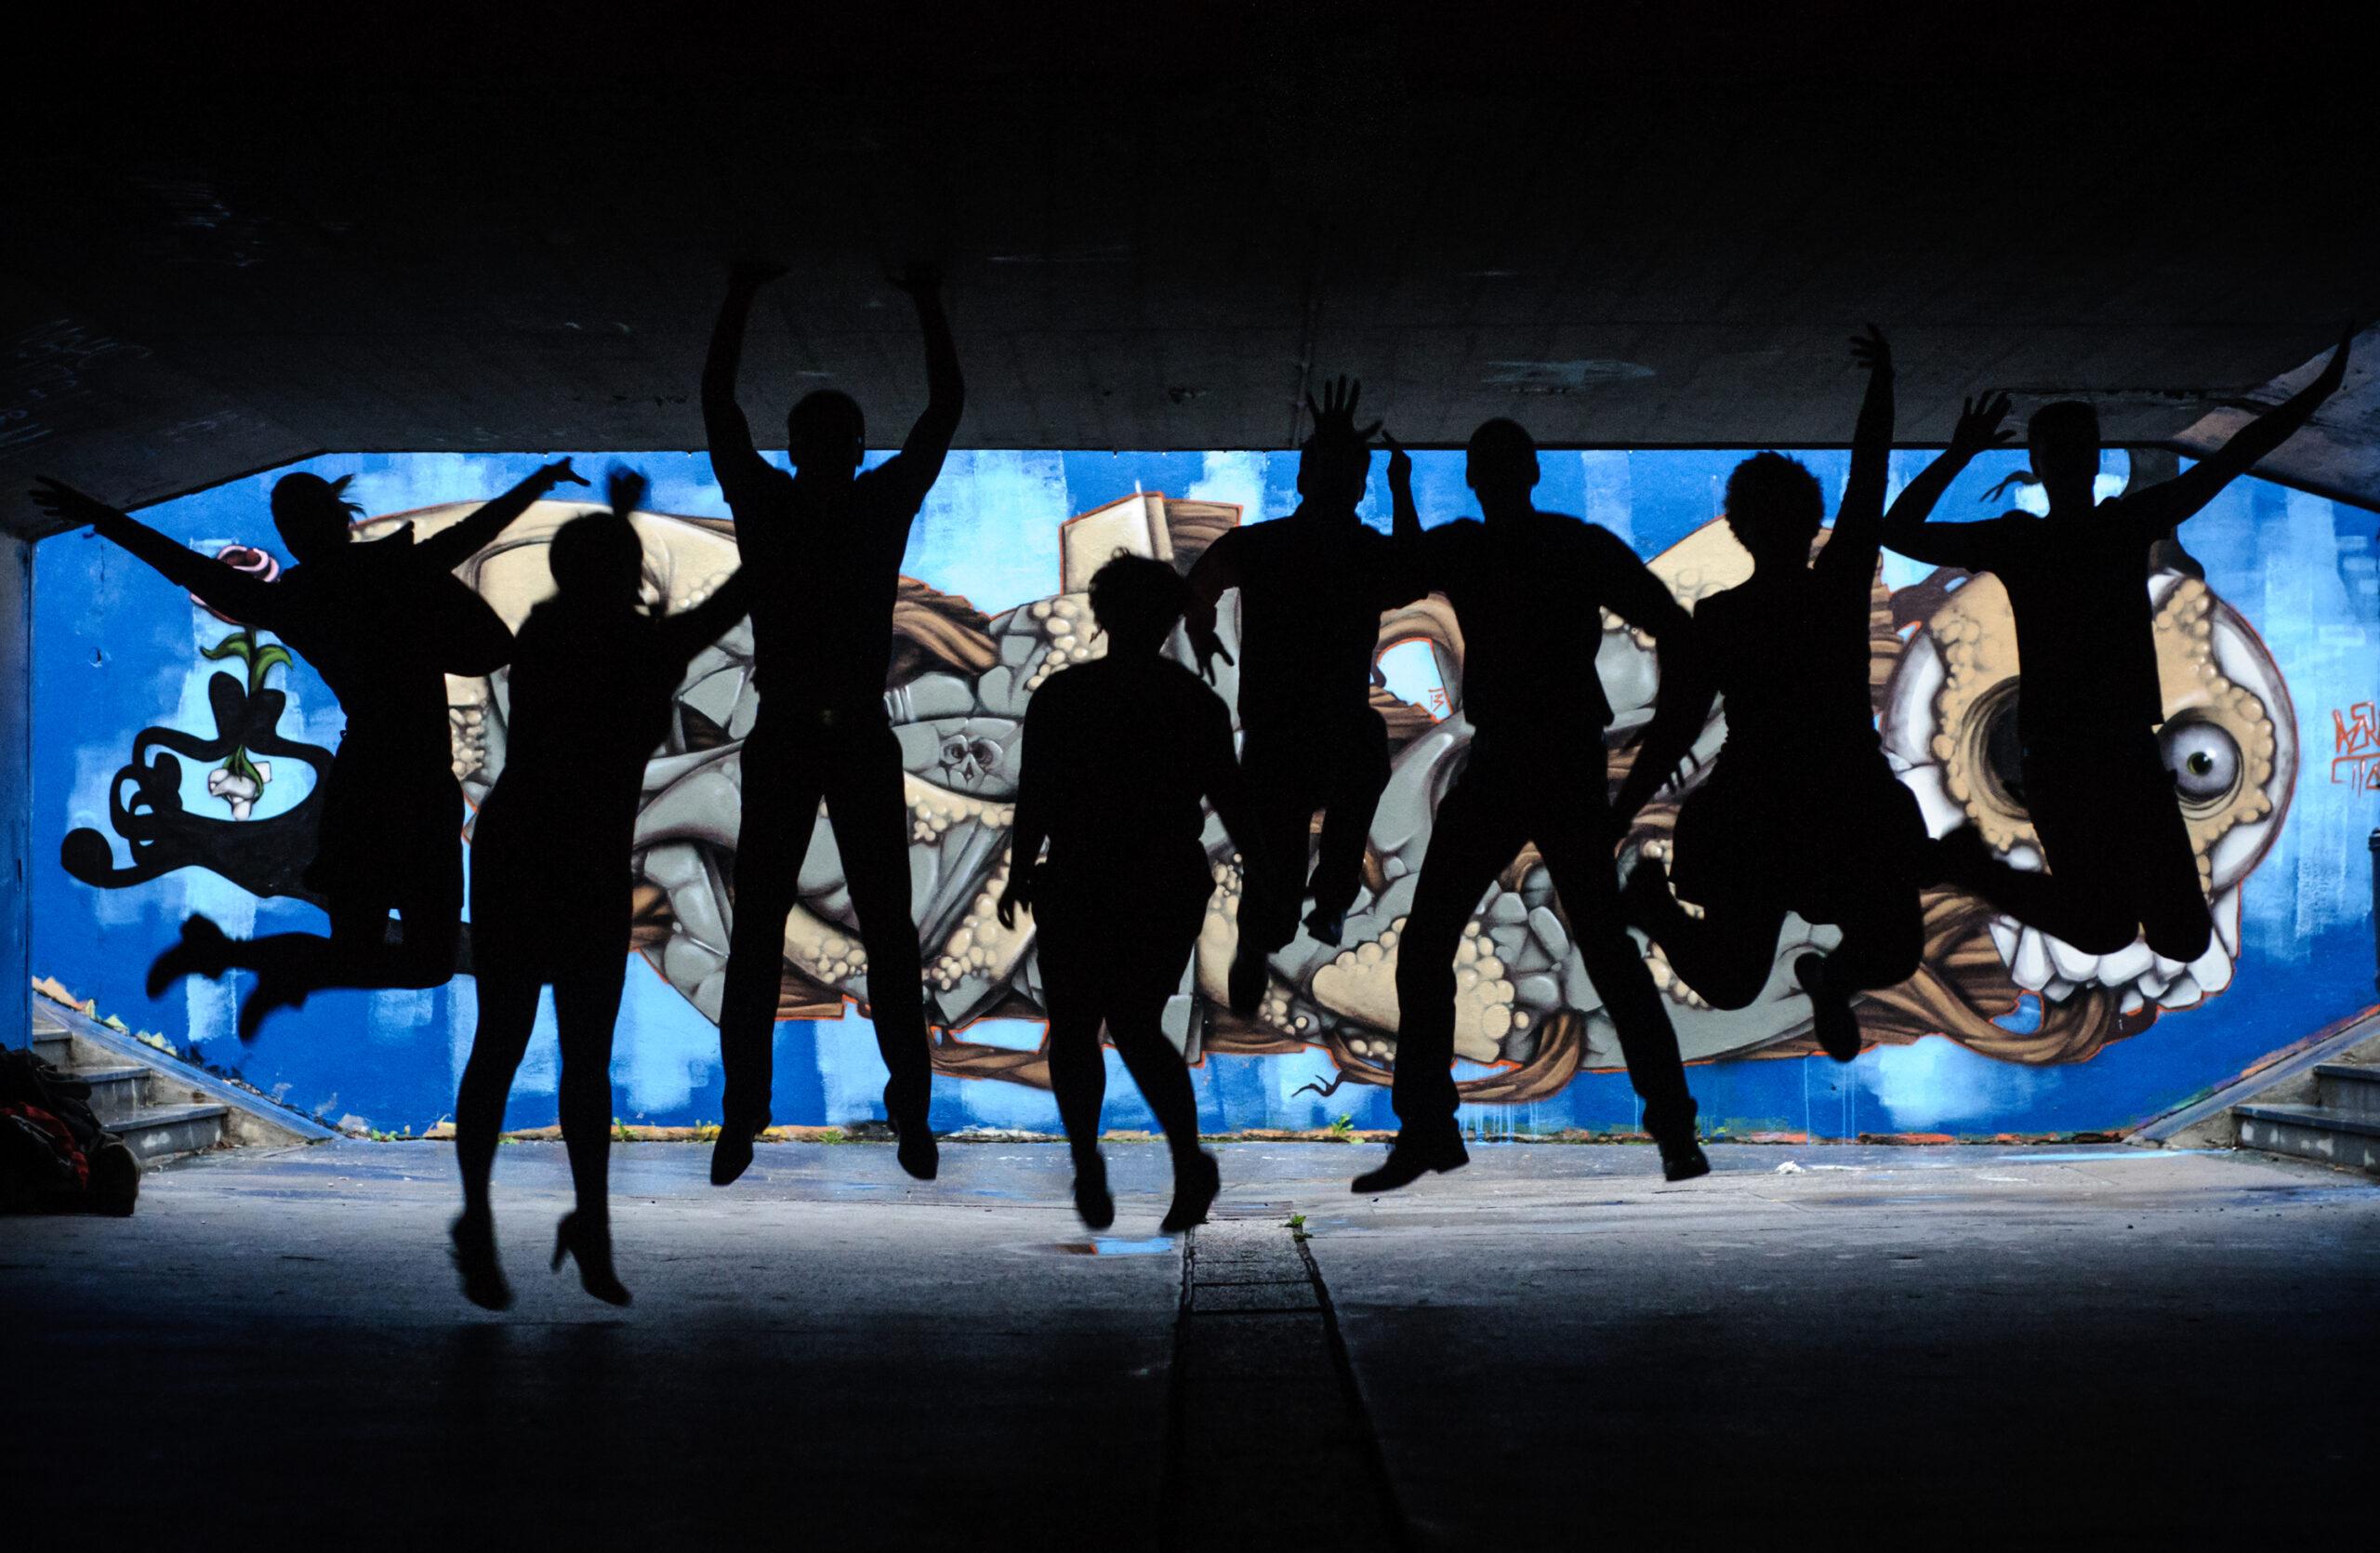 Jure Matoz, Slovenia: Live Graffiti, Jazzva, Slovenia - Ljubljana's urban culture is an inspiration and a playground for the Jazzva vocal group.